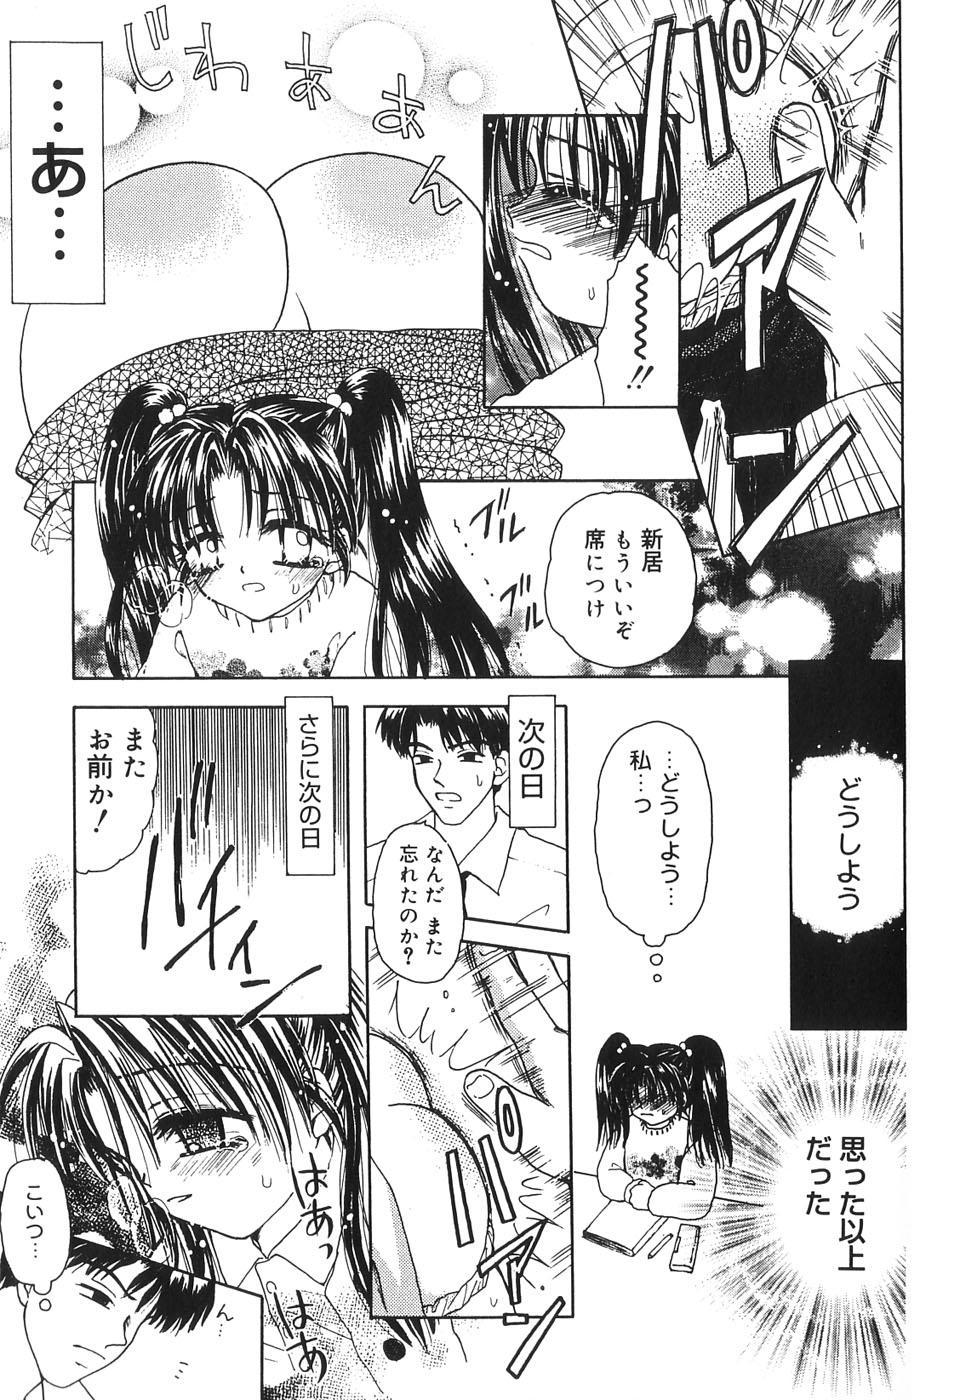 Musoubana 127